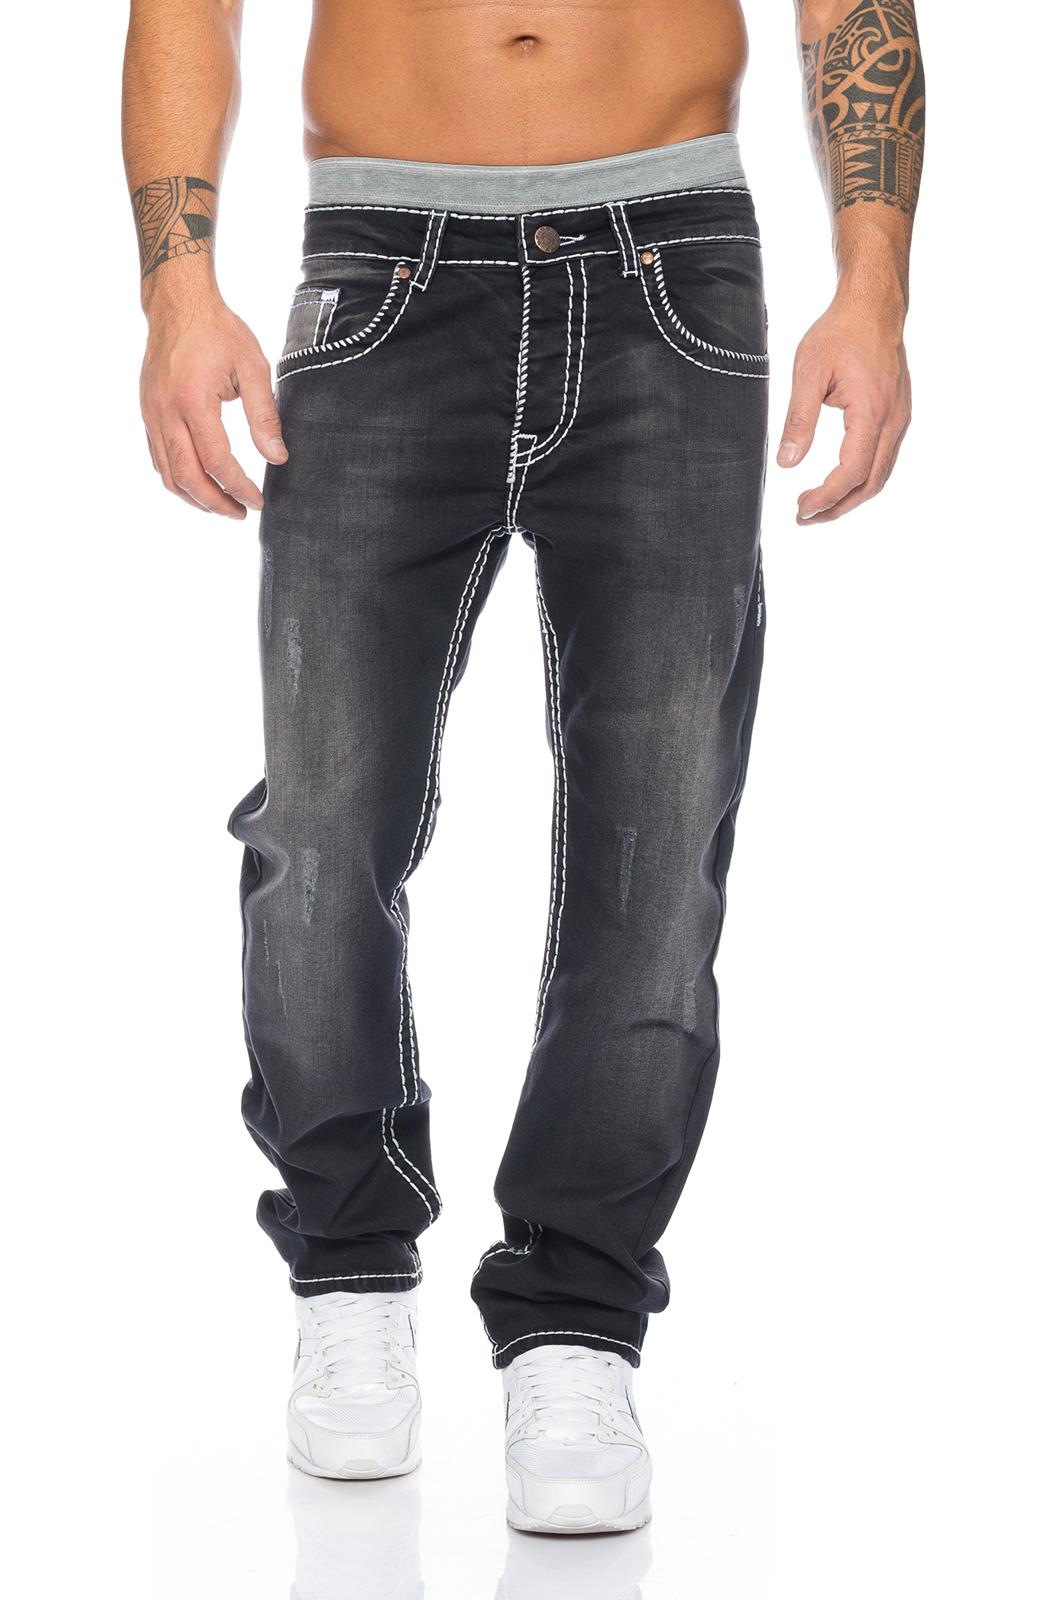 rockcreek herren denim designer jeans hose schwarz dicke wei e n hte neu rc 2047. Black Bedroom Furniture Sets. Home Design Ideas